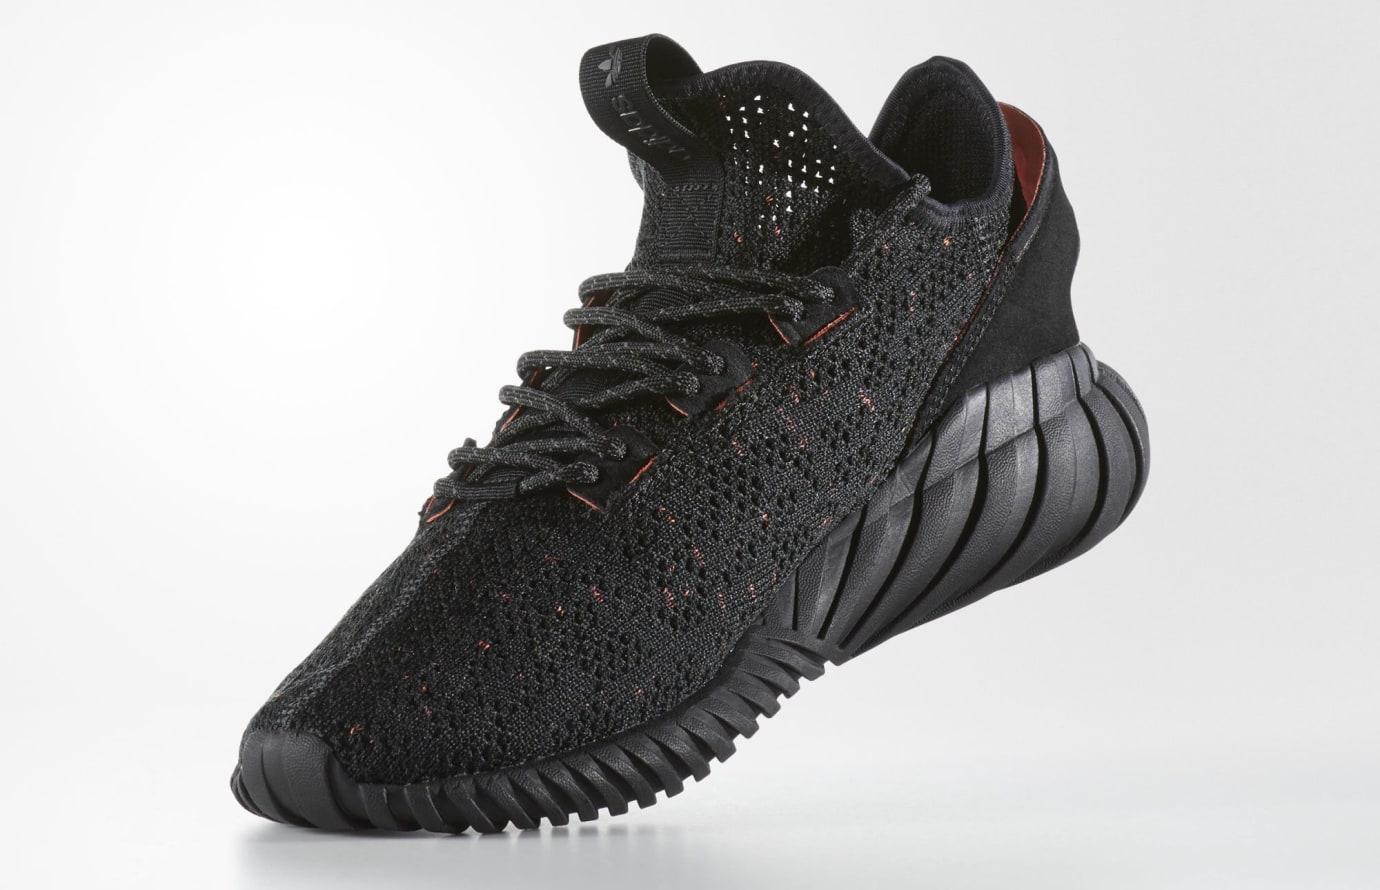 Image via Adidas Triple Black Adidas Tubular Doom Soc BY3559 Medial ff350fea4946